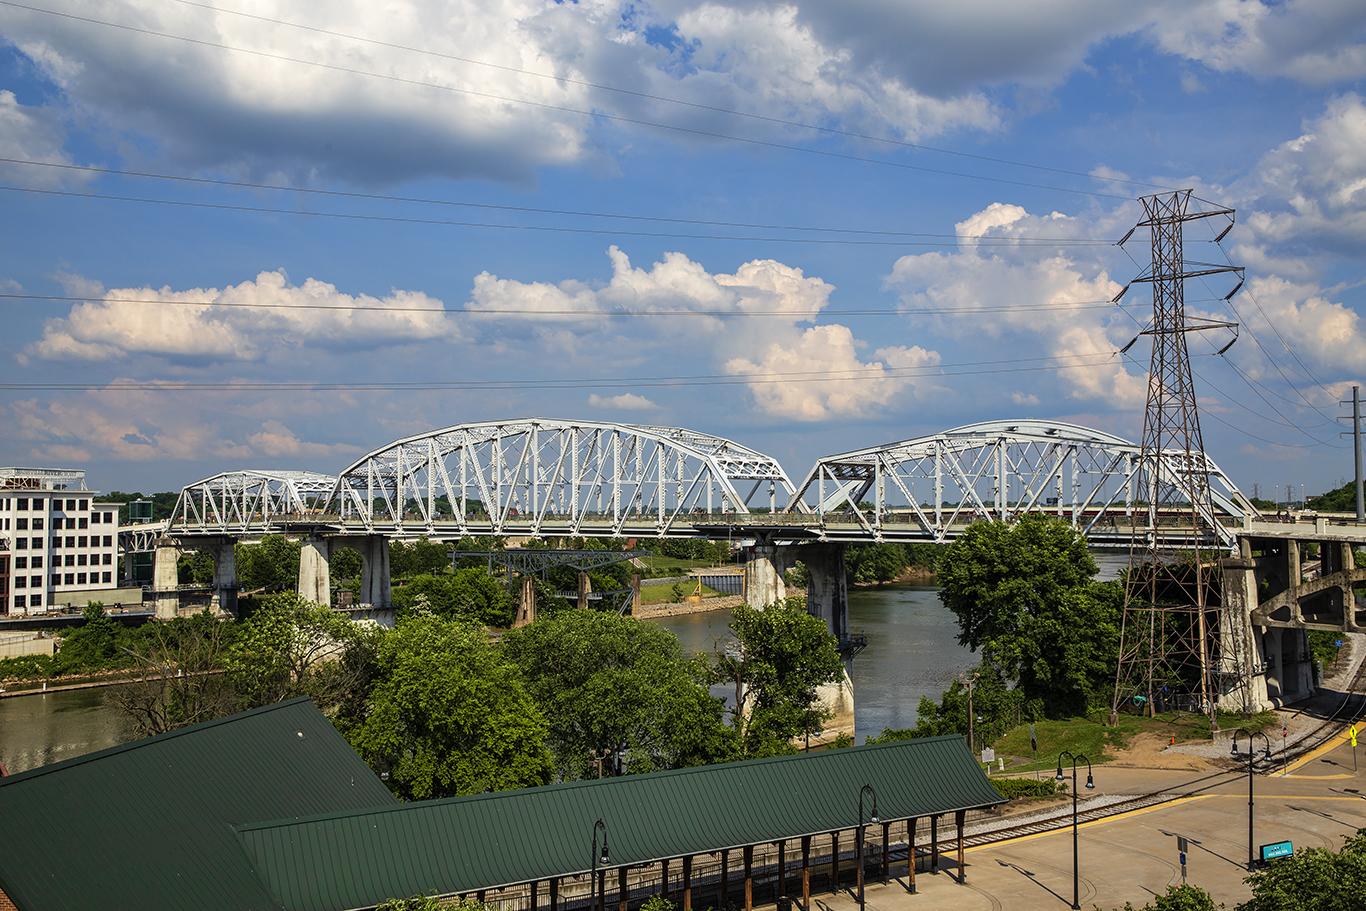 The John Seigenthaler Bridge over the Cumberland River